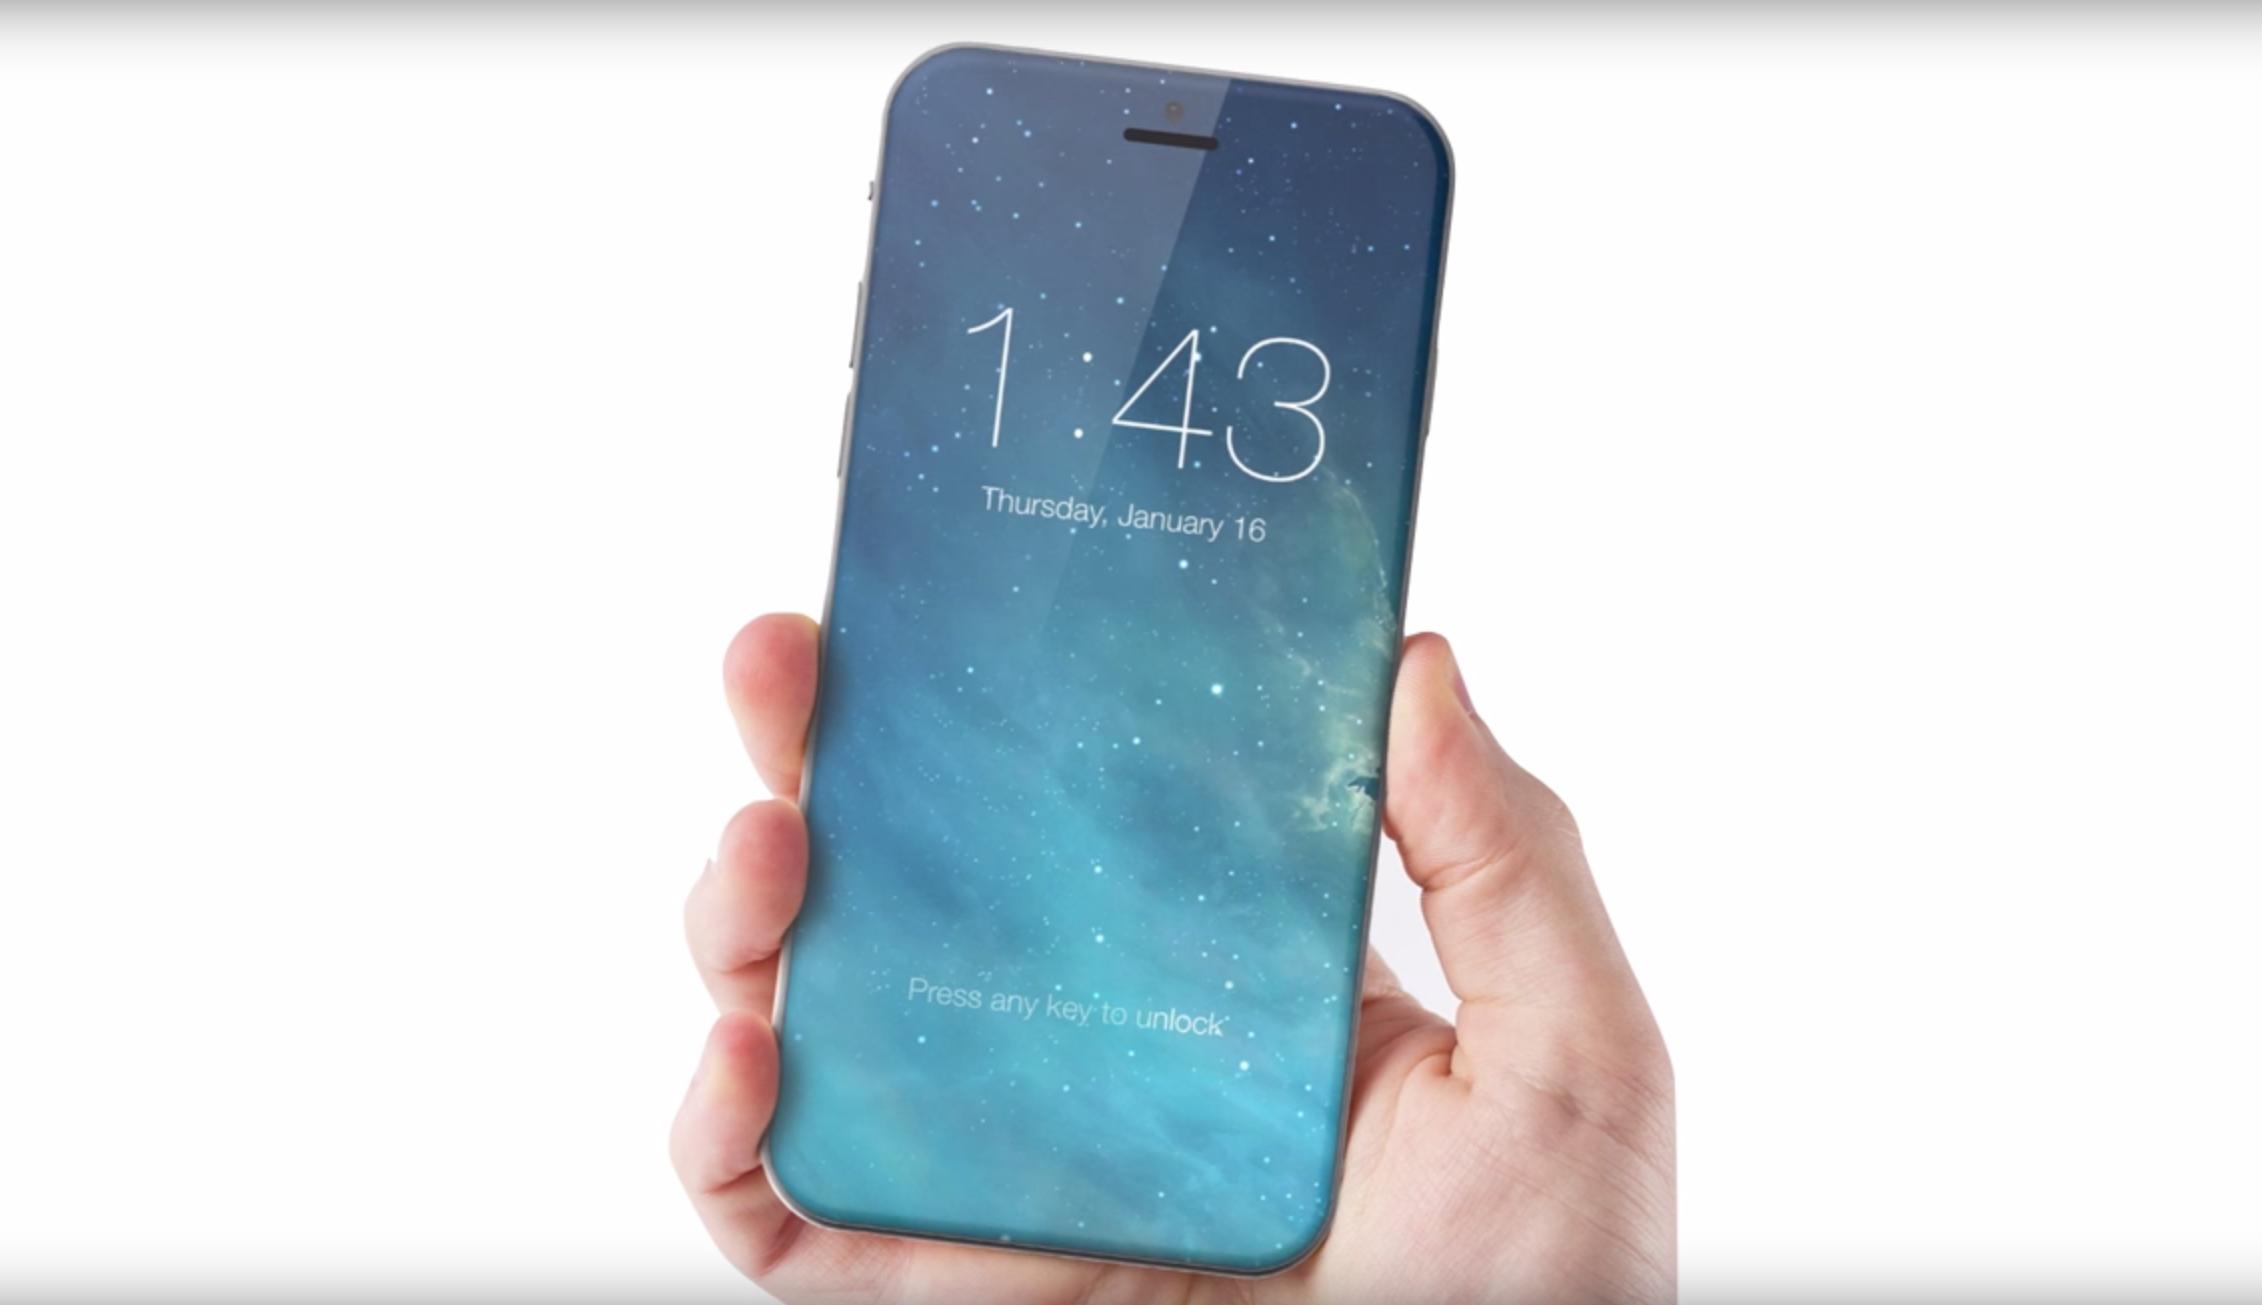 iphone-8-leak-wireless-charging